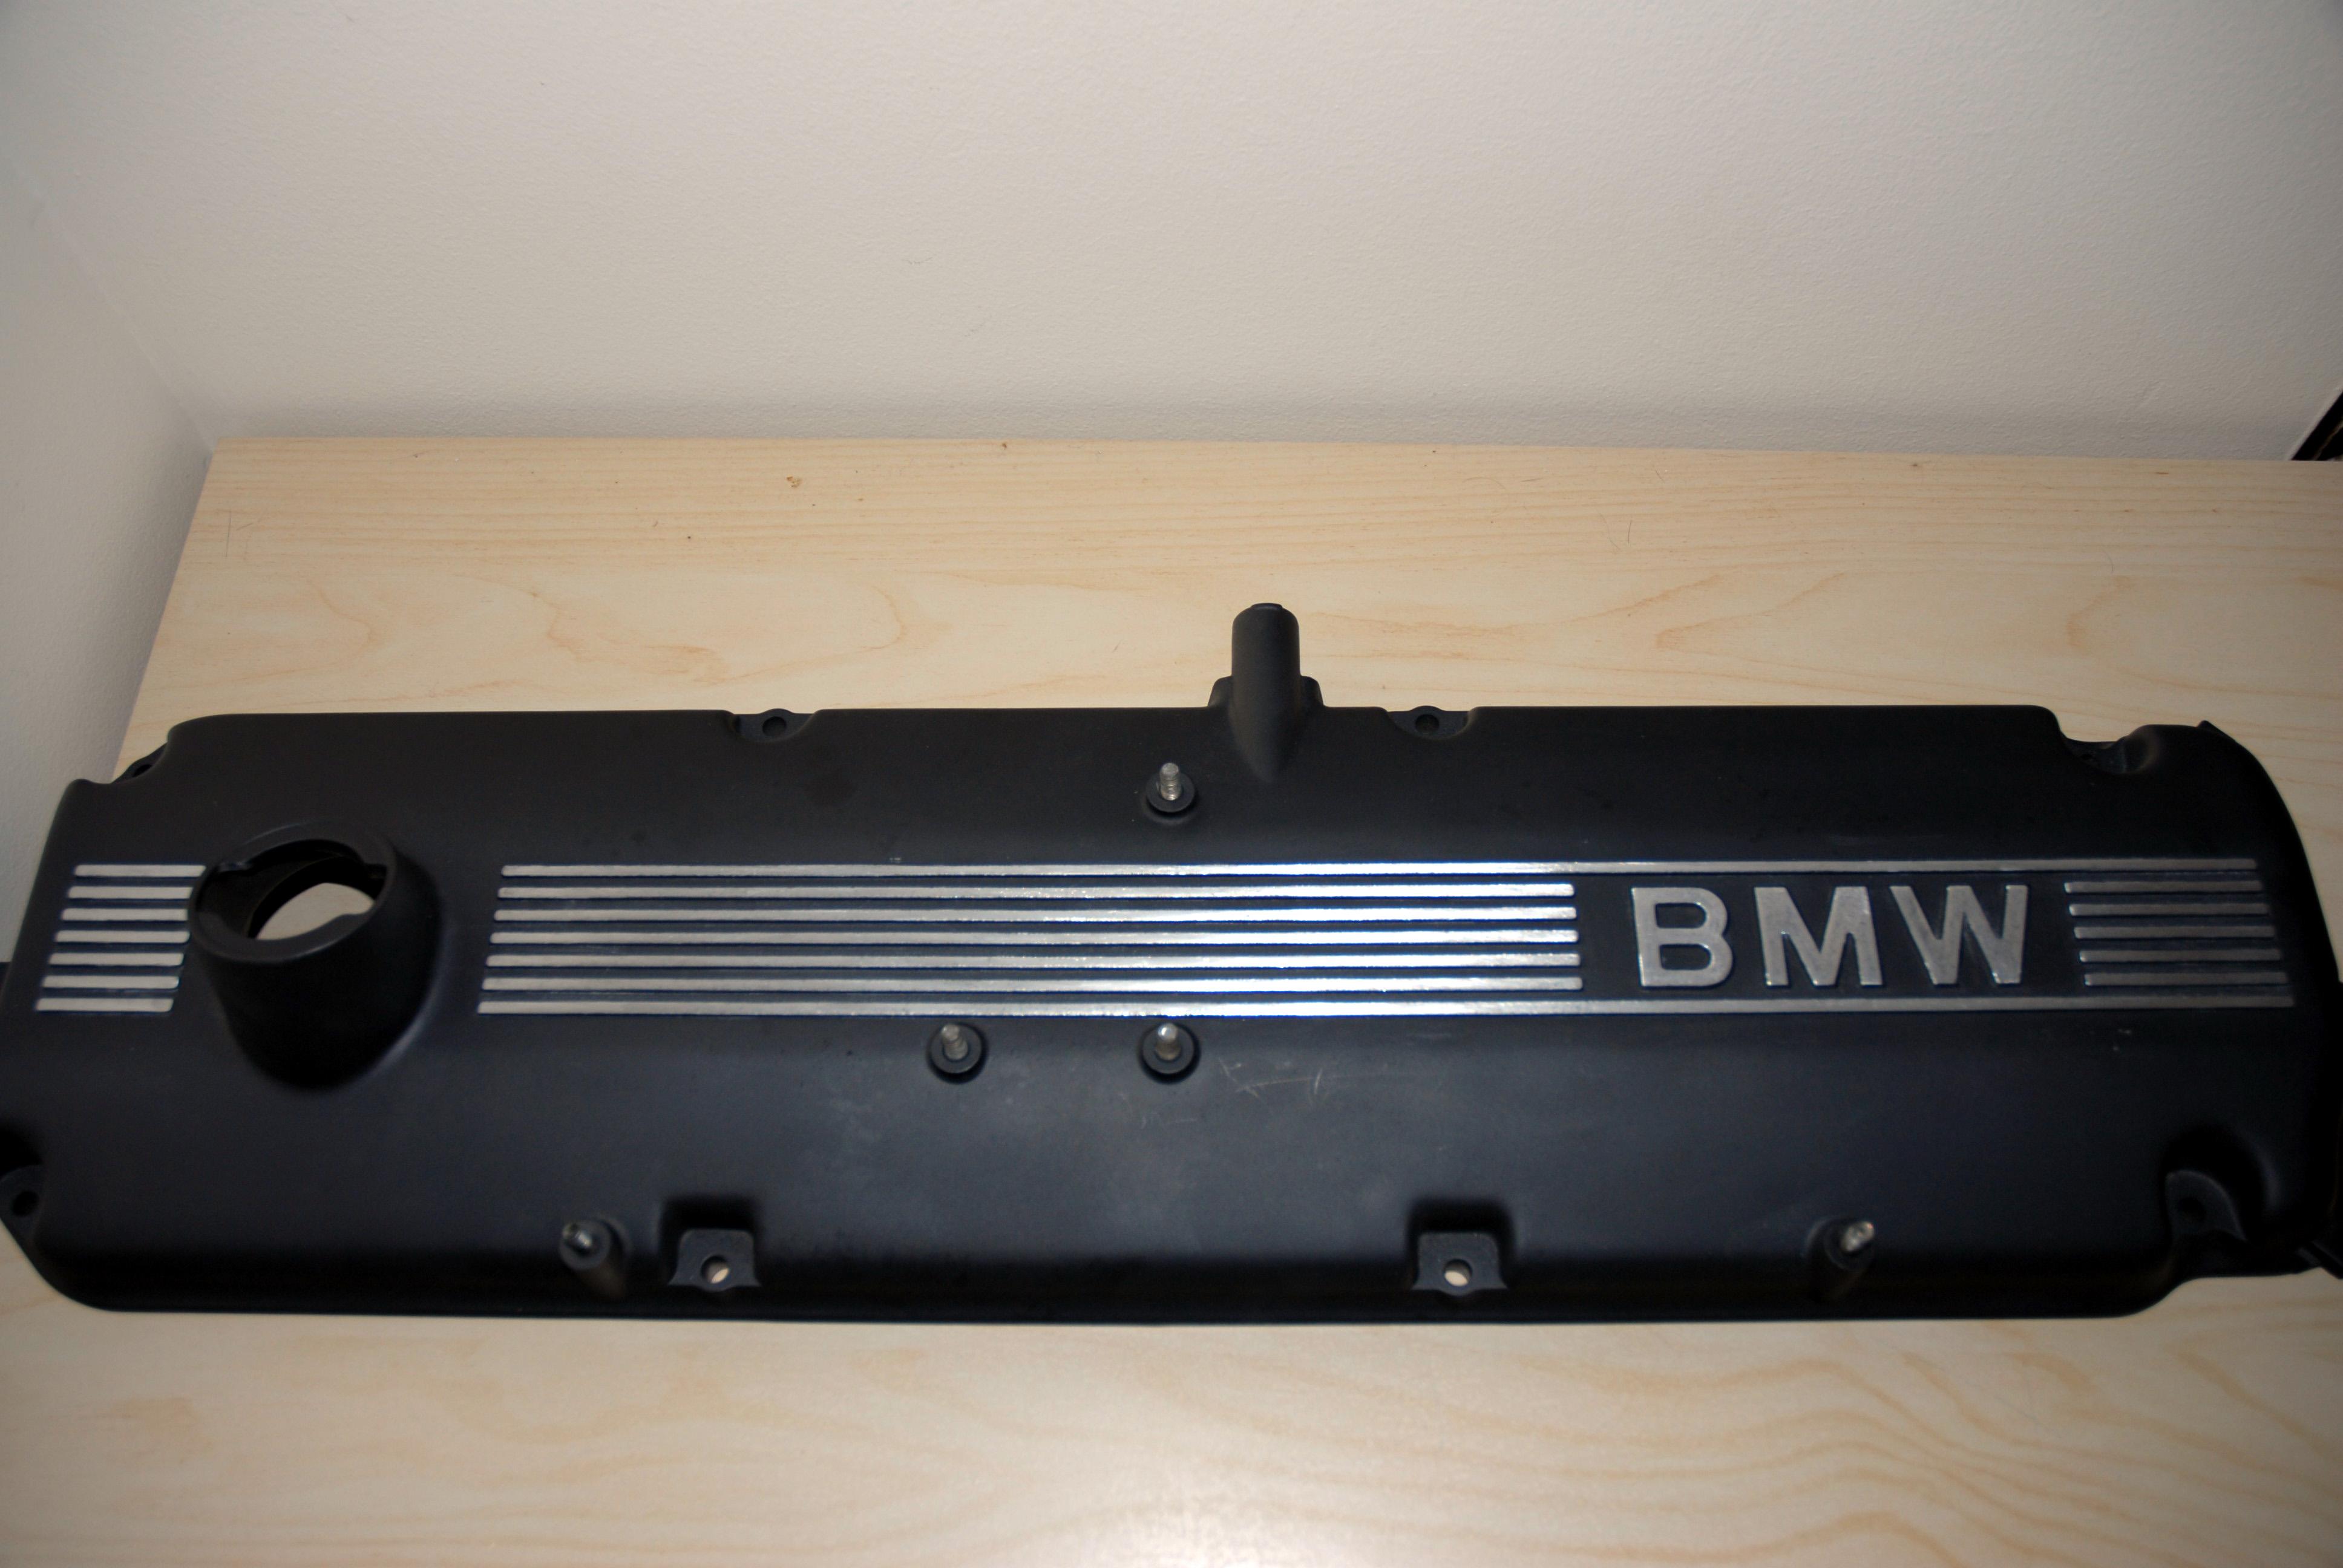 FS: 1990 BMW E34 535i Manifold Cover - Sport Black-nik_0072.jpg